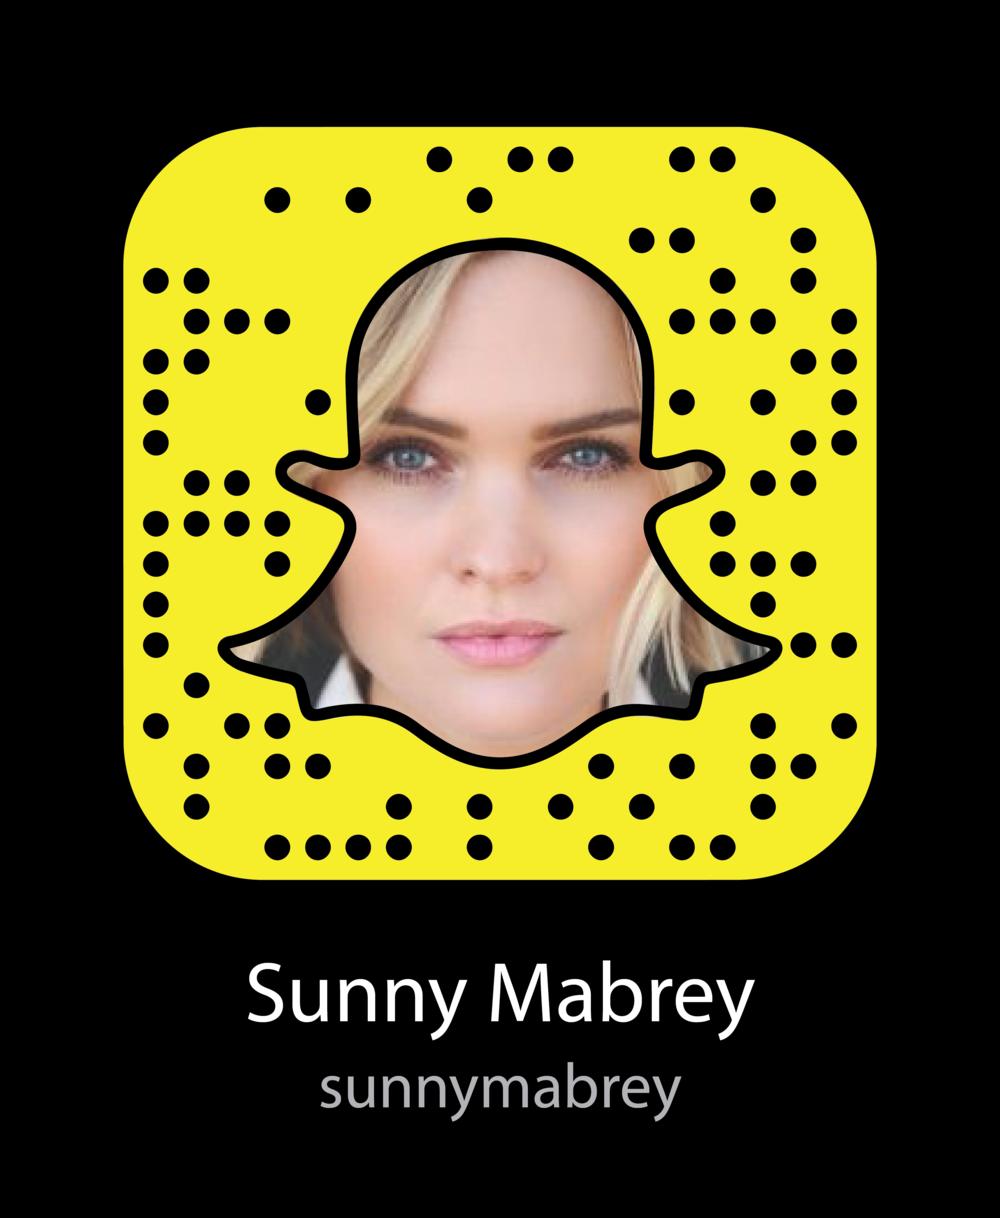 sunny-mabrey-vine-celebrity-snapchat-snapcode